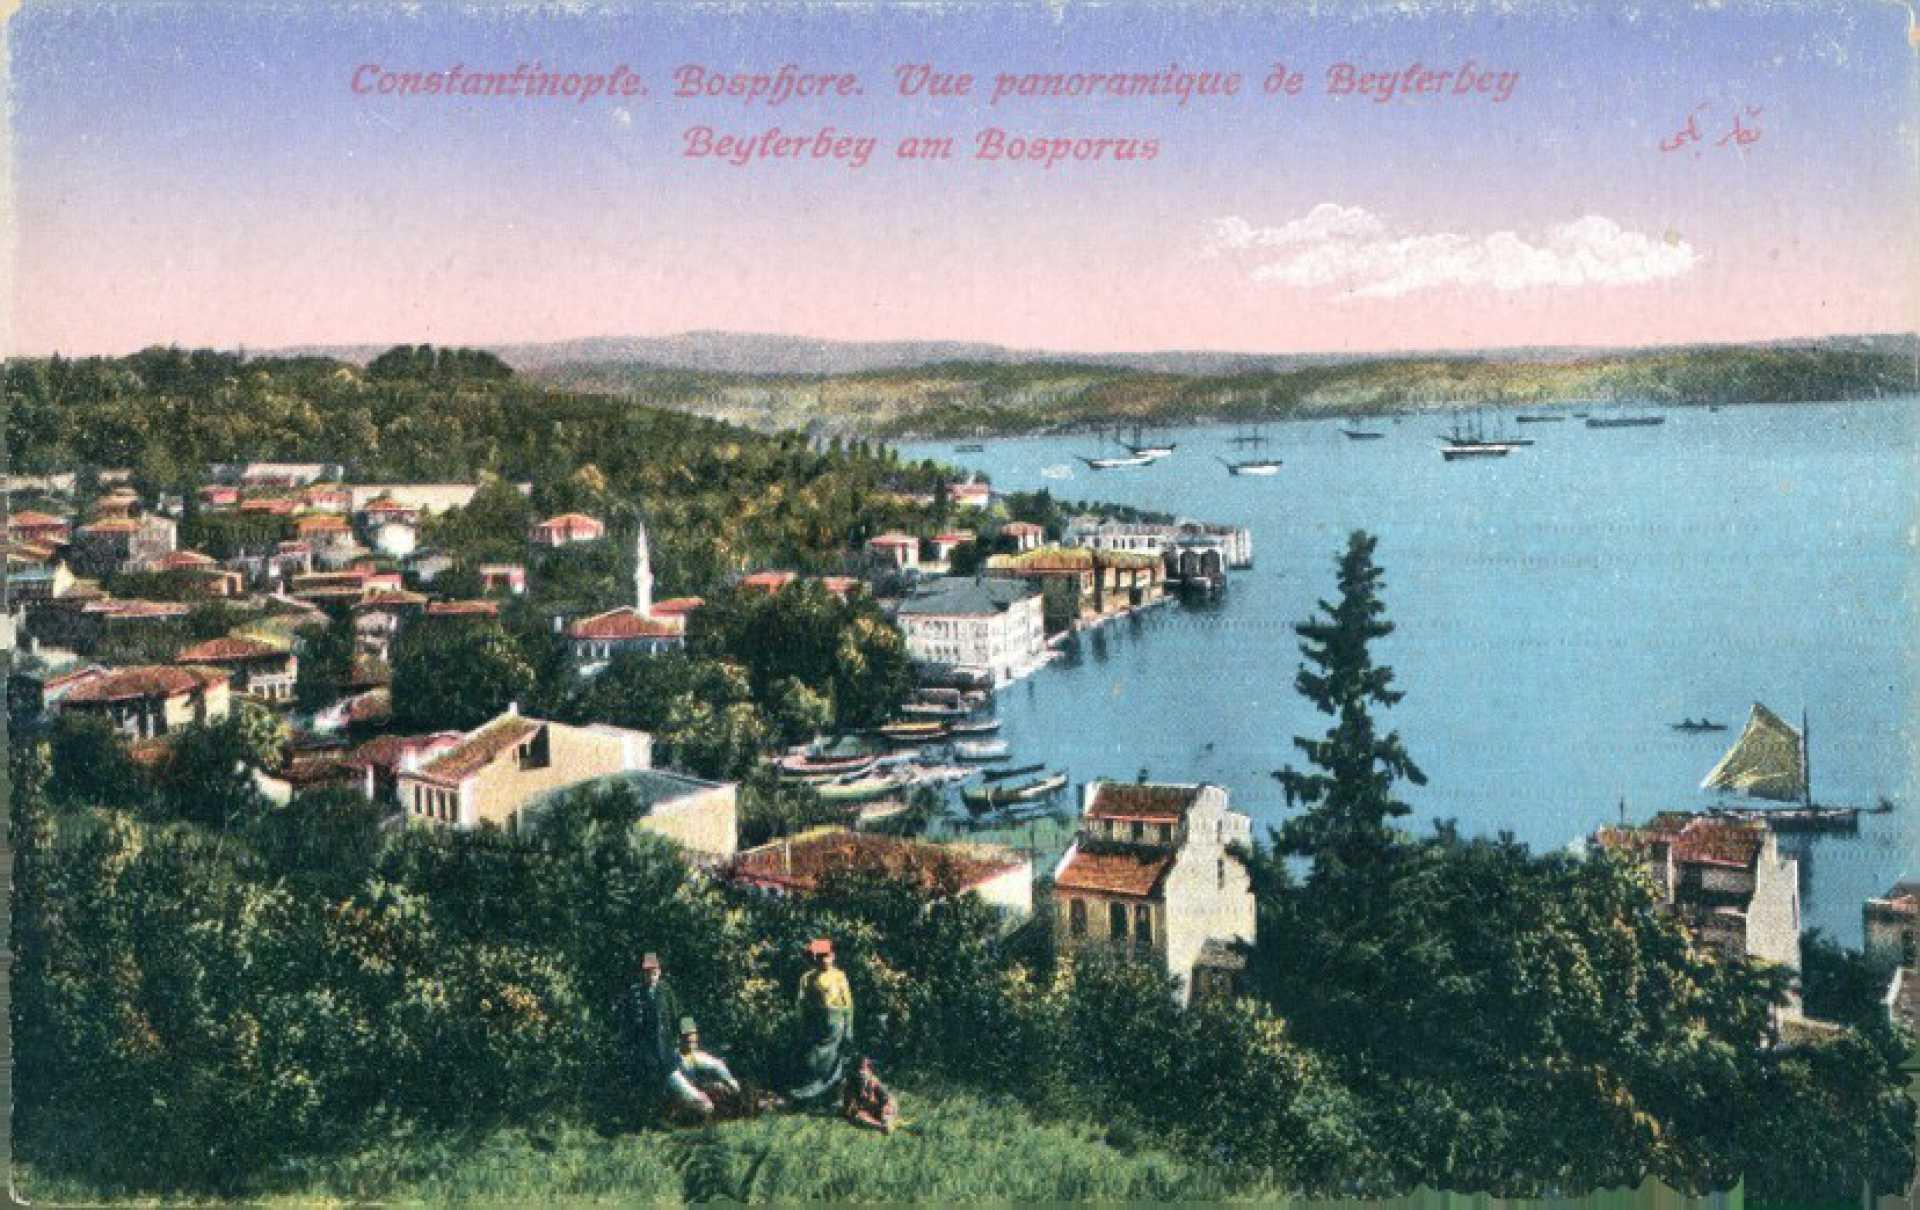 Vue panoramique du Beylerbey. Beylerbey am Bosporus